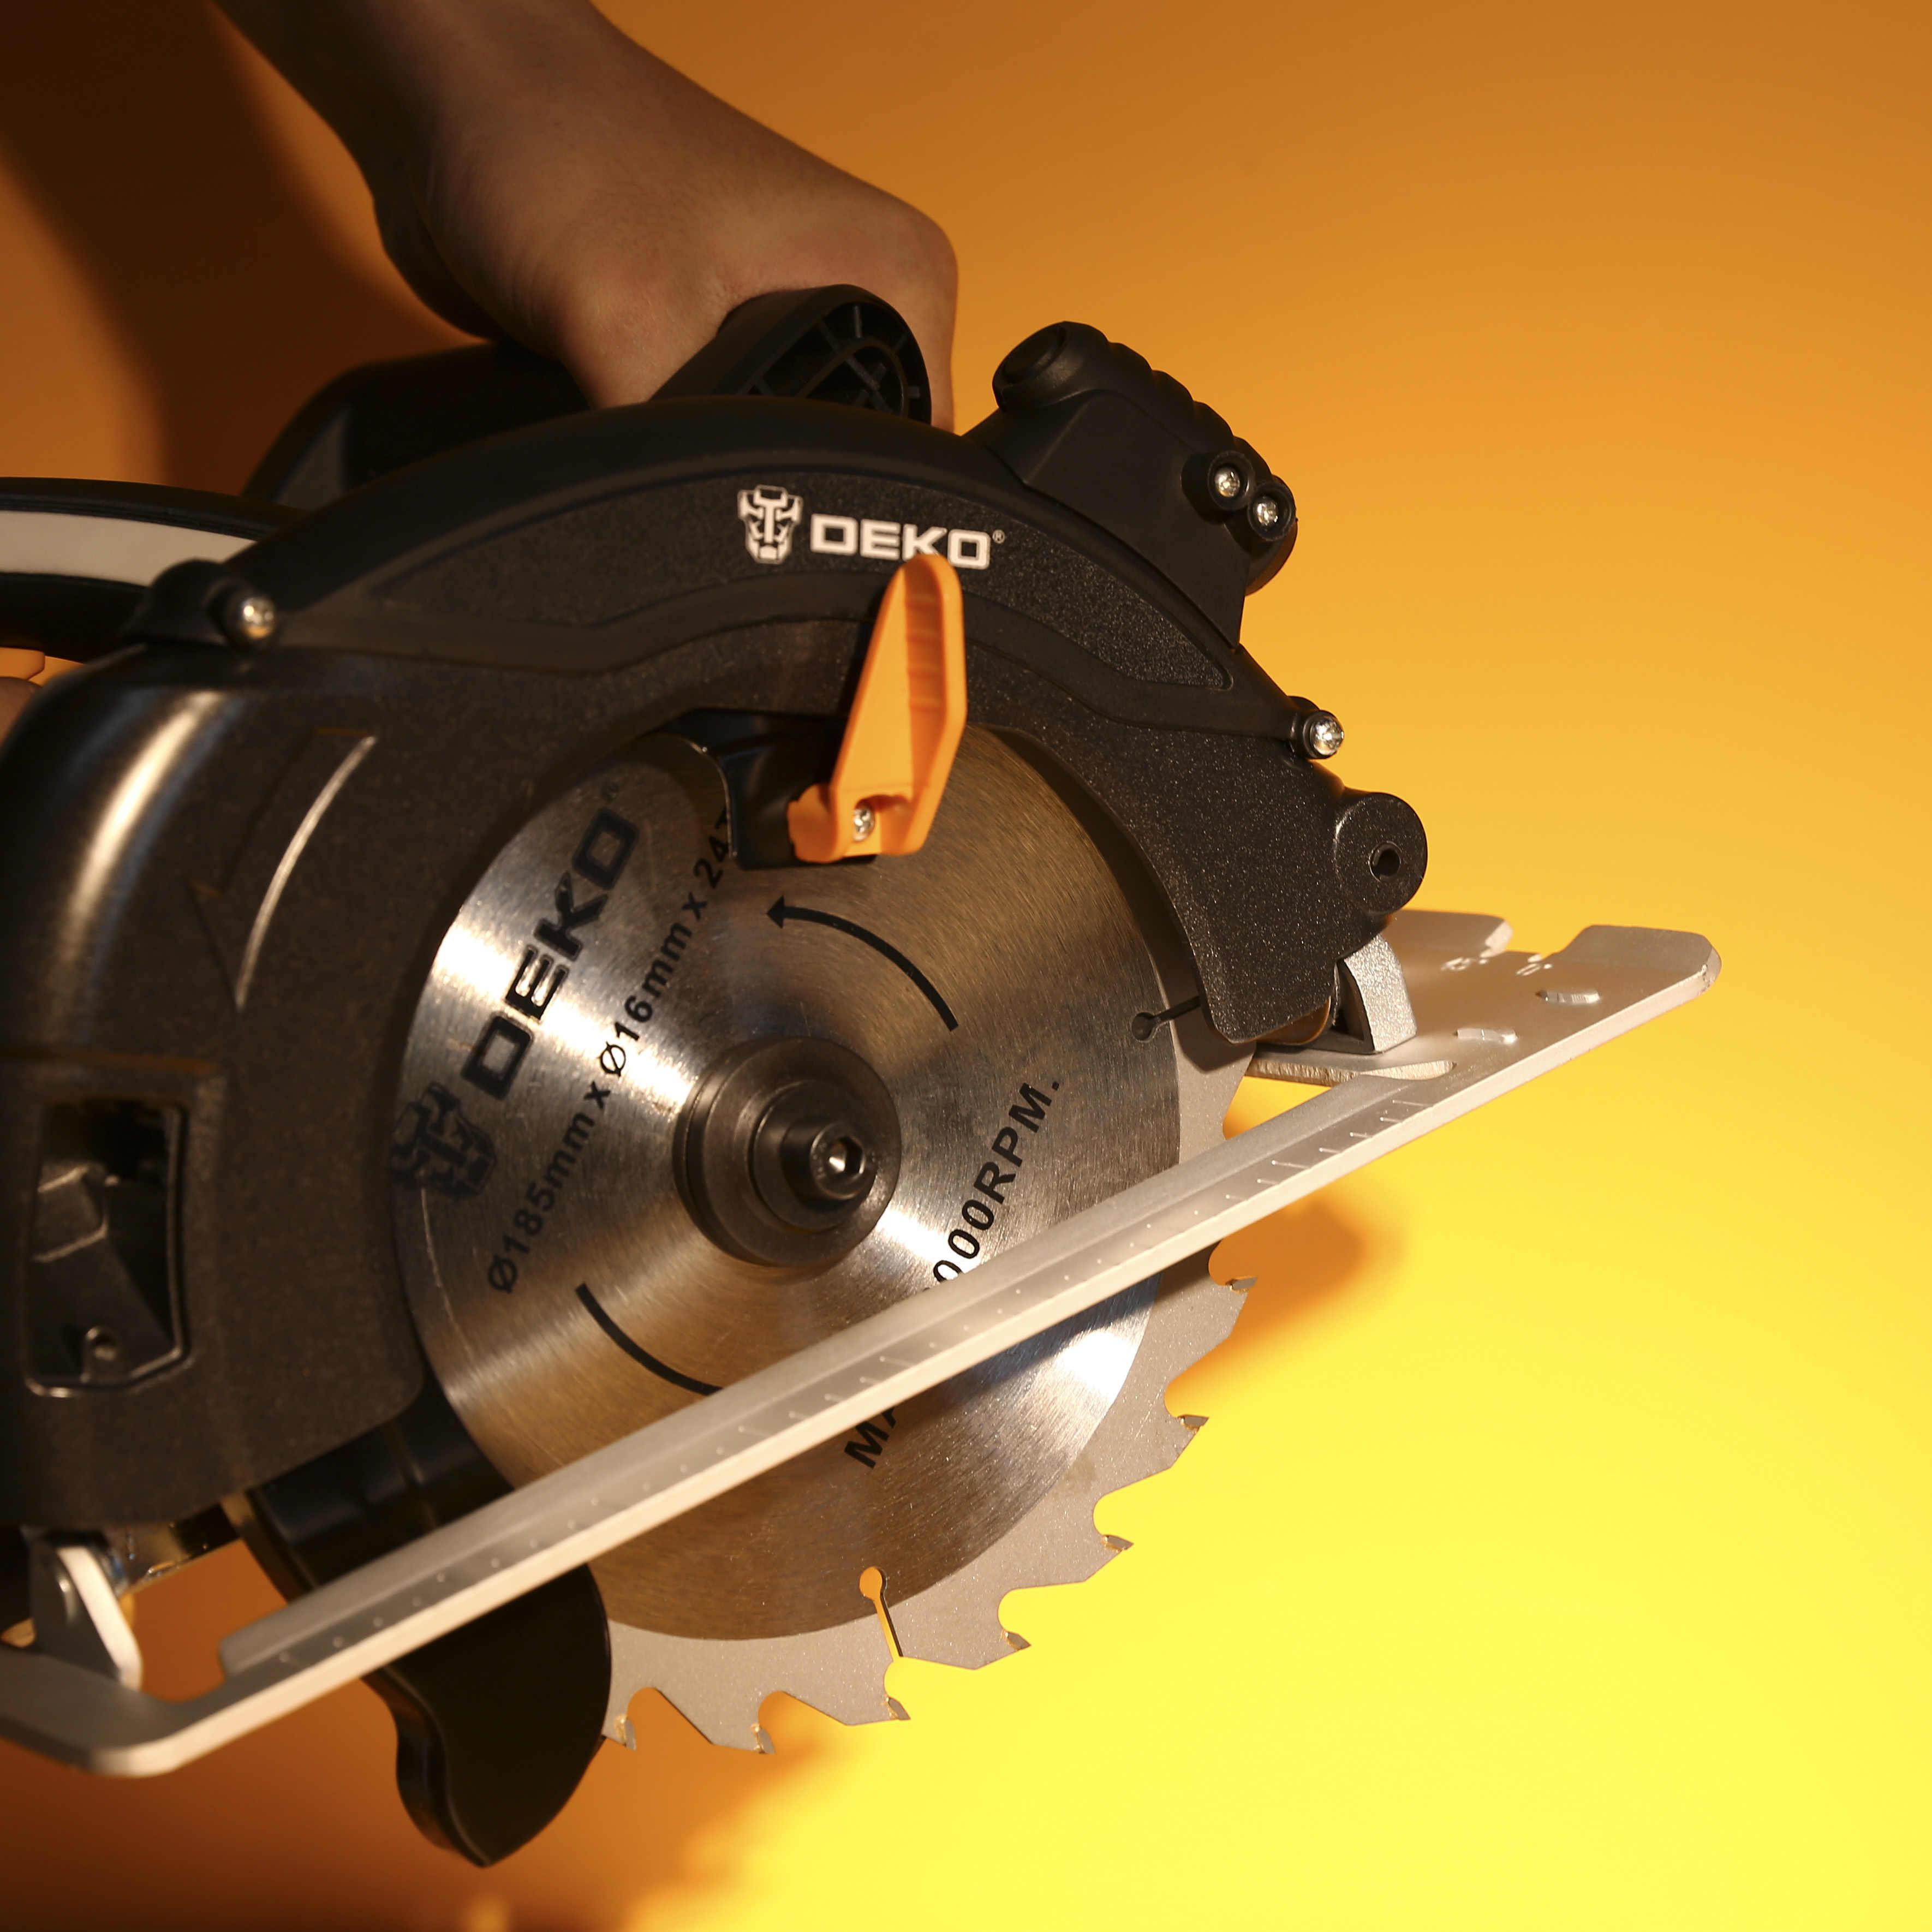 DEKO DKCS1600 מסור עגול כוח כלים עם להב, אבק מעבר, עזר ידית, גבוהה כוח רב פונקציה חיתוך Machin